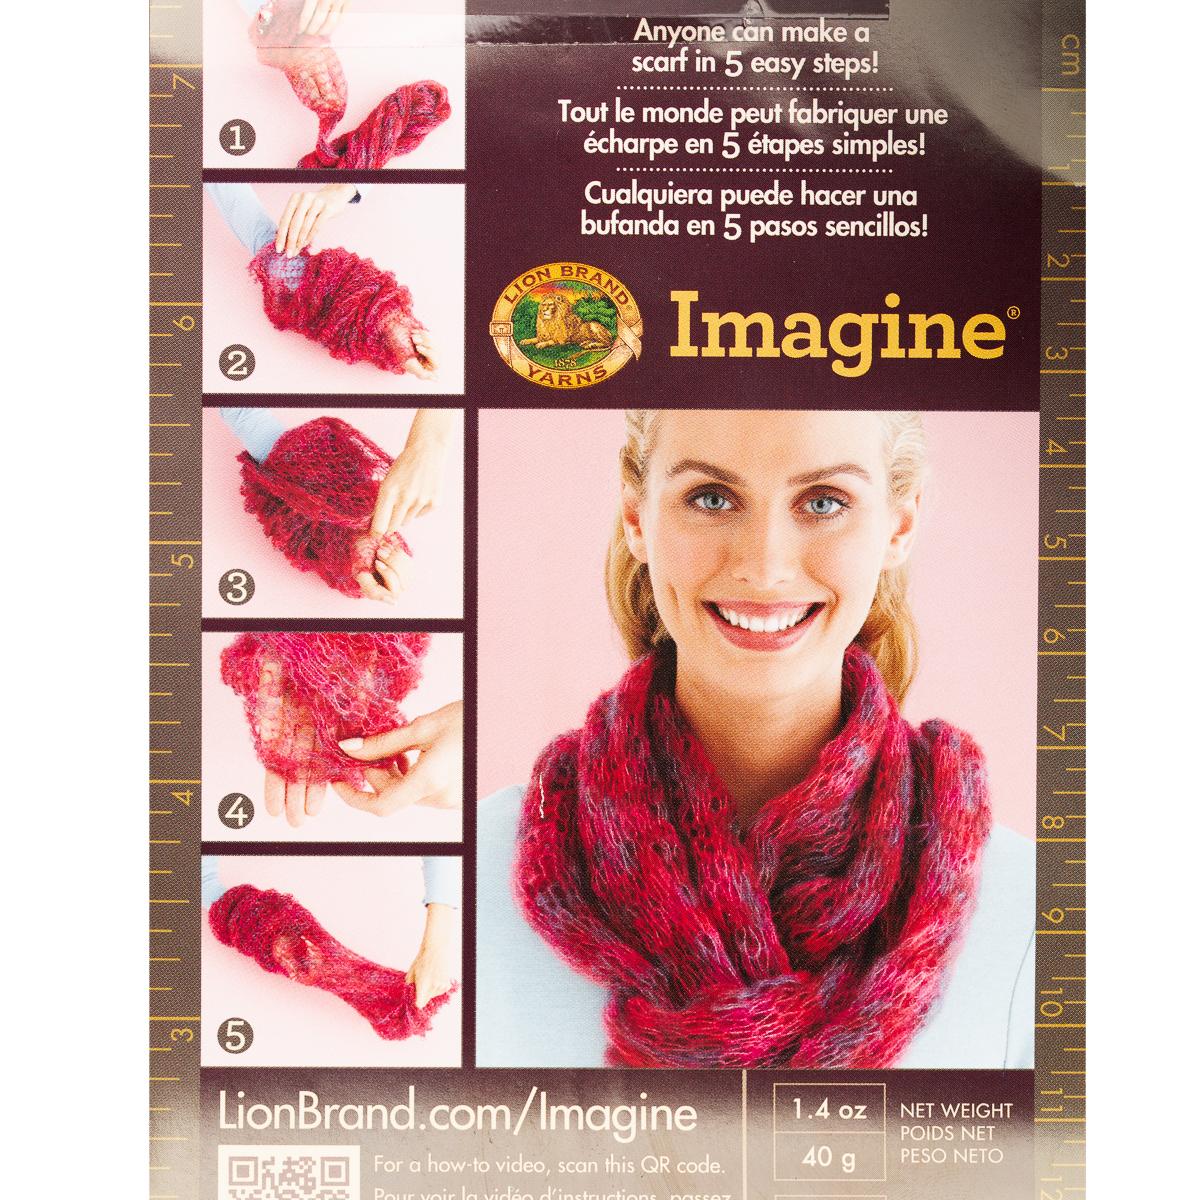 thumbnail 16 - 3pk-Lion-Brand-Imagine-Acrylic-Blend-Yarn-Super-Bulky-6-Knitting-Crochet-Soft